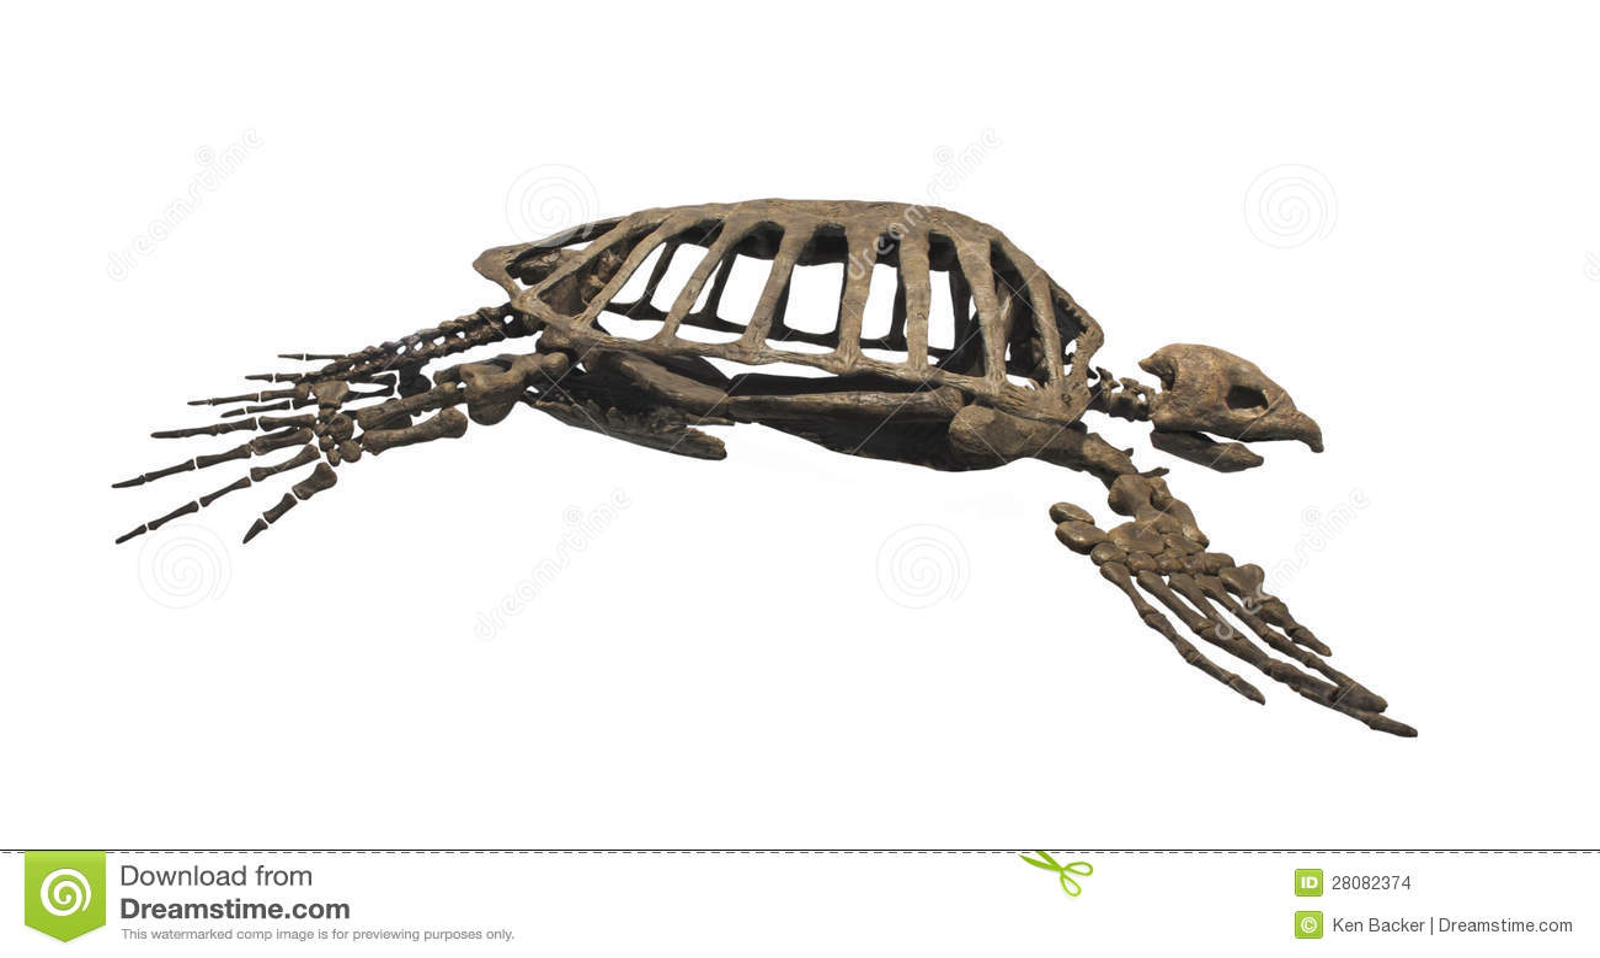 giant leatherback turtles